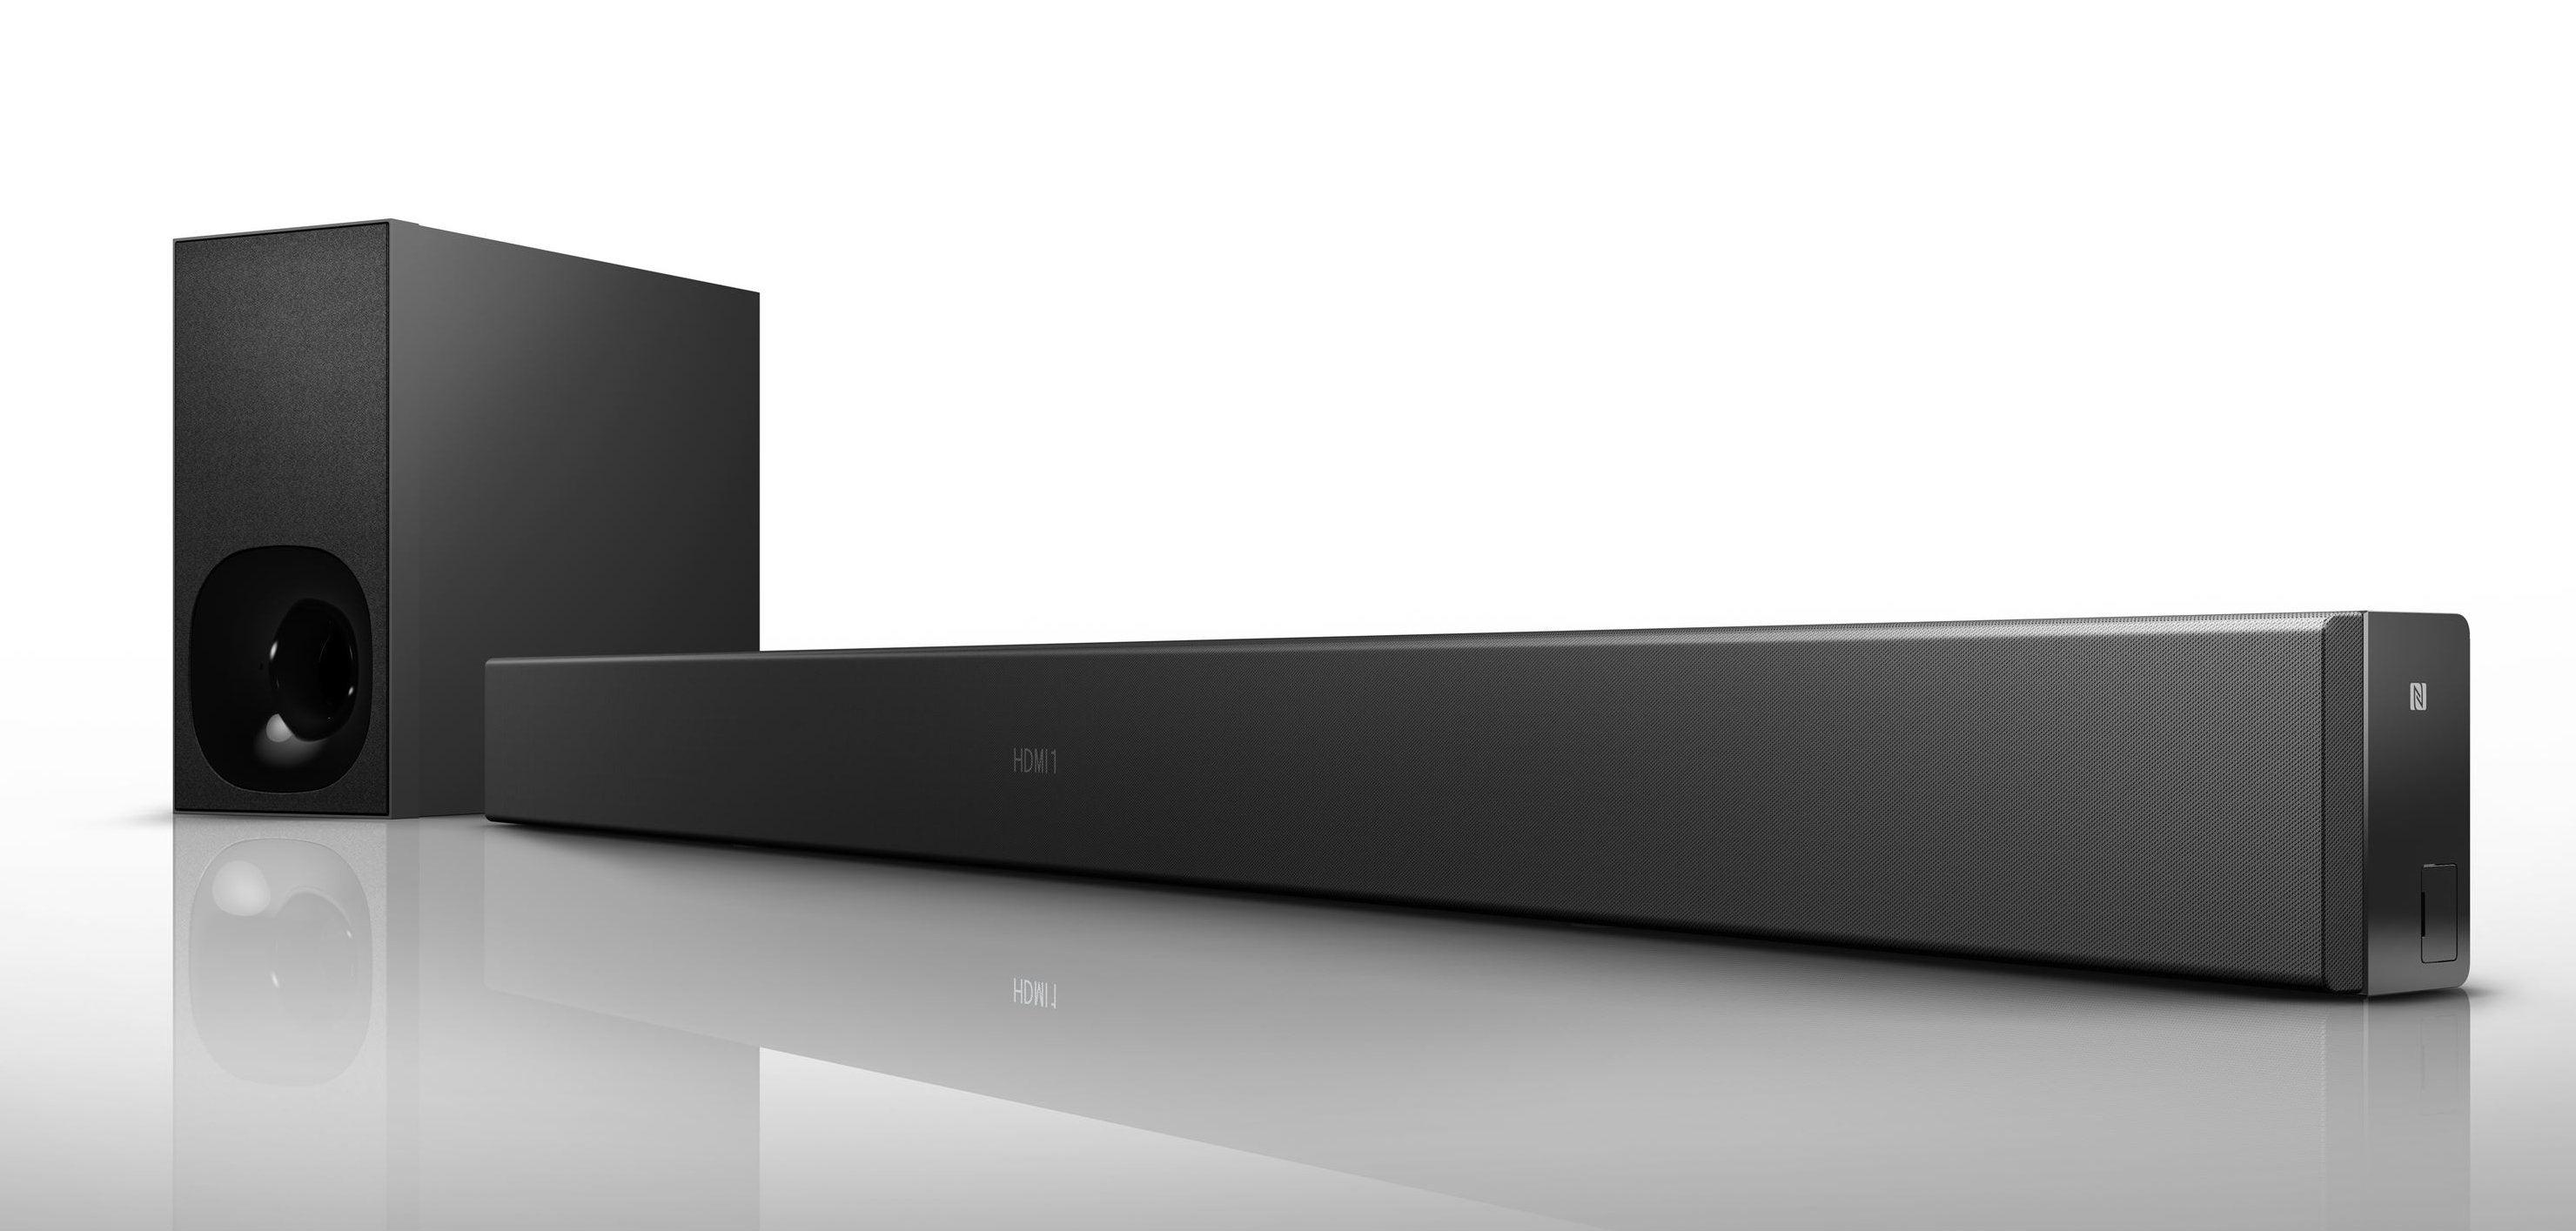 Sony Walkman Reborn (Again) As a $US1200 Hi-Res Audio Handset